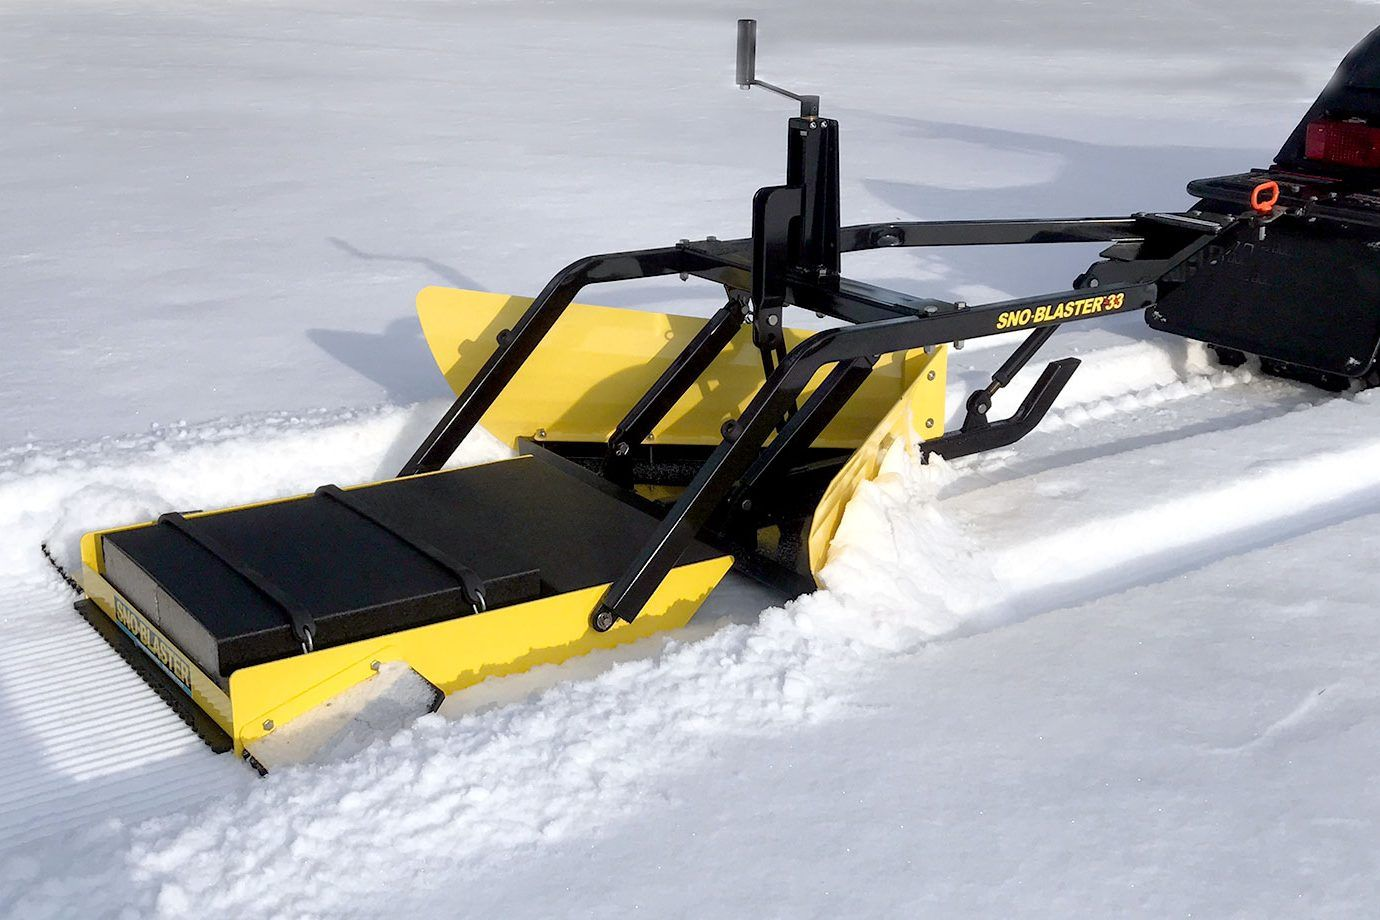 Narrow Single Track Groomers Snow Grooming Equipment In 2020 Groomer Atv Implements Snow